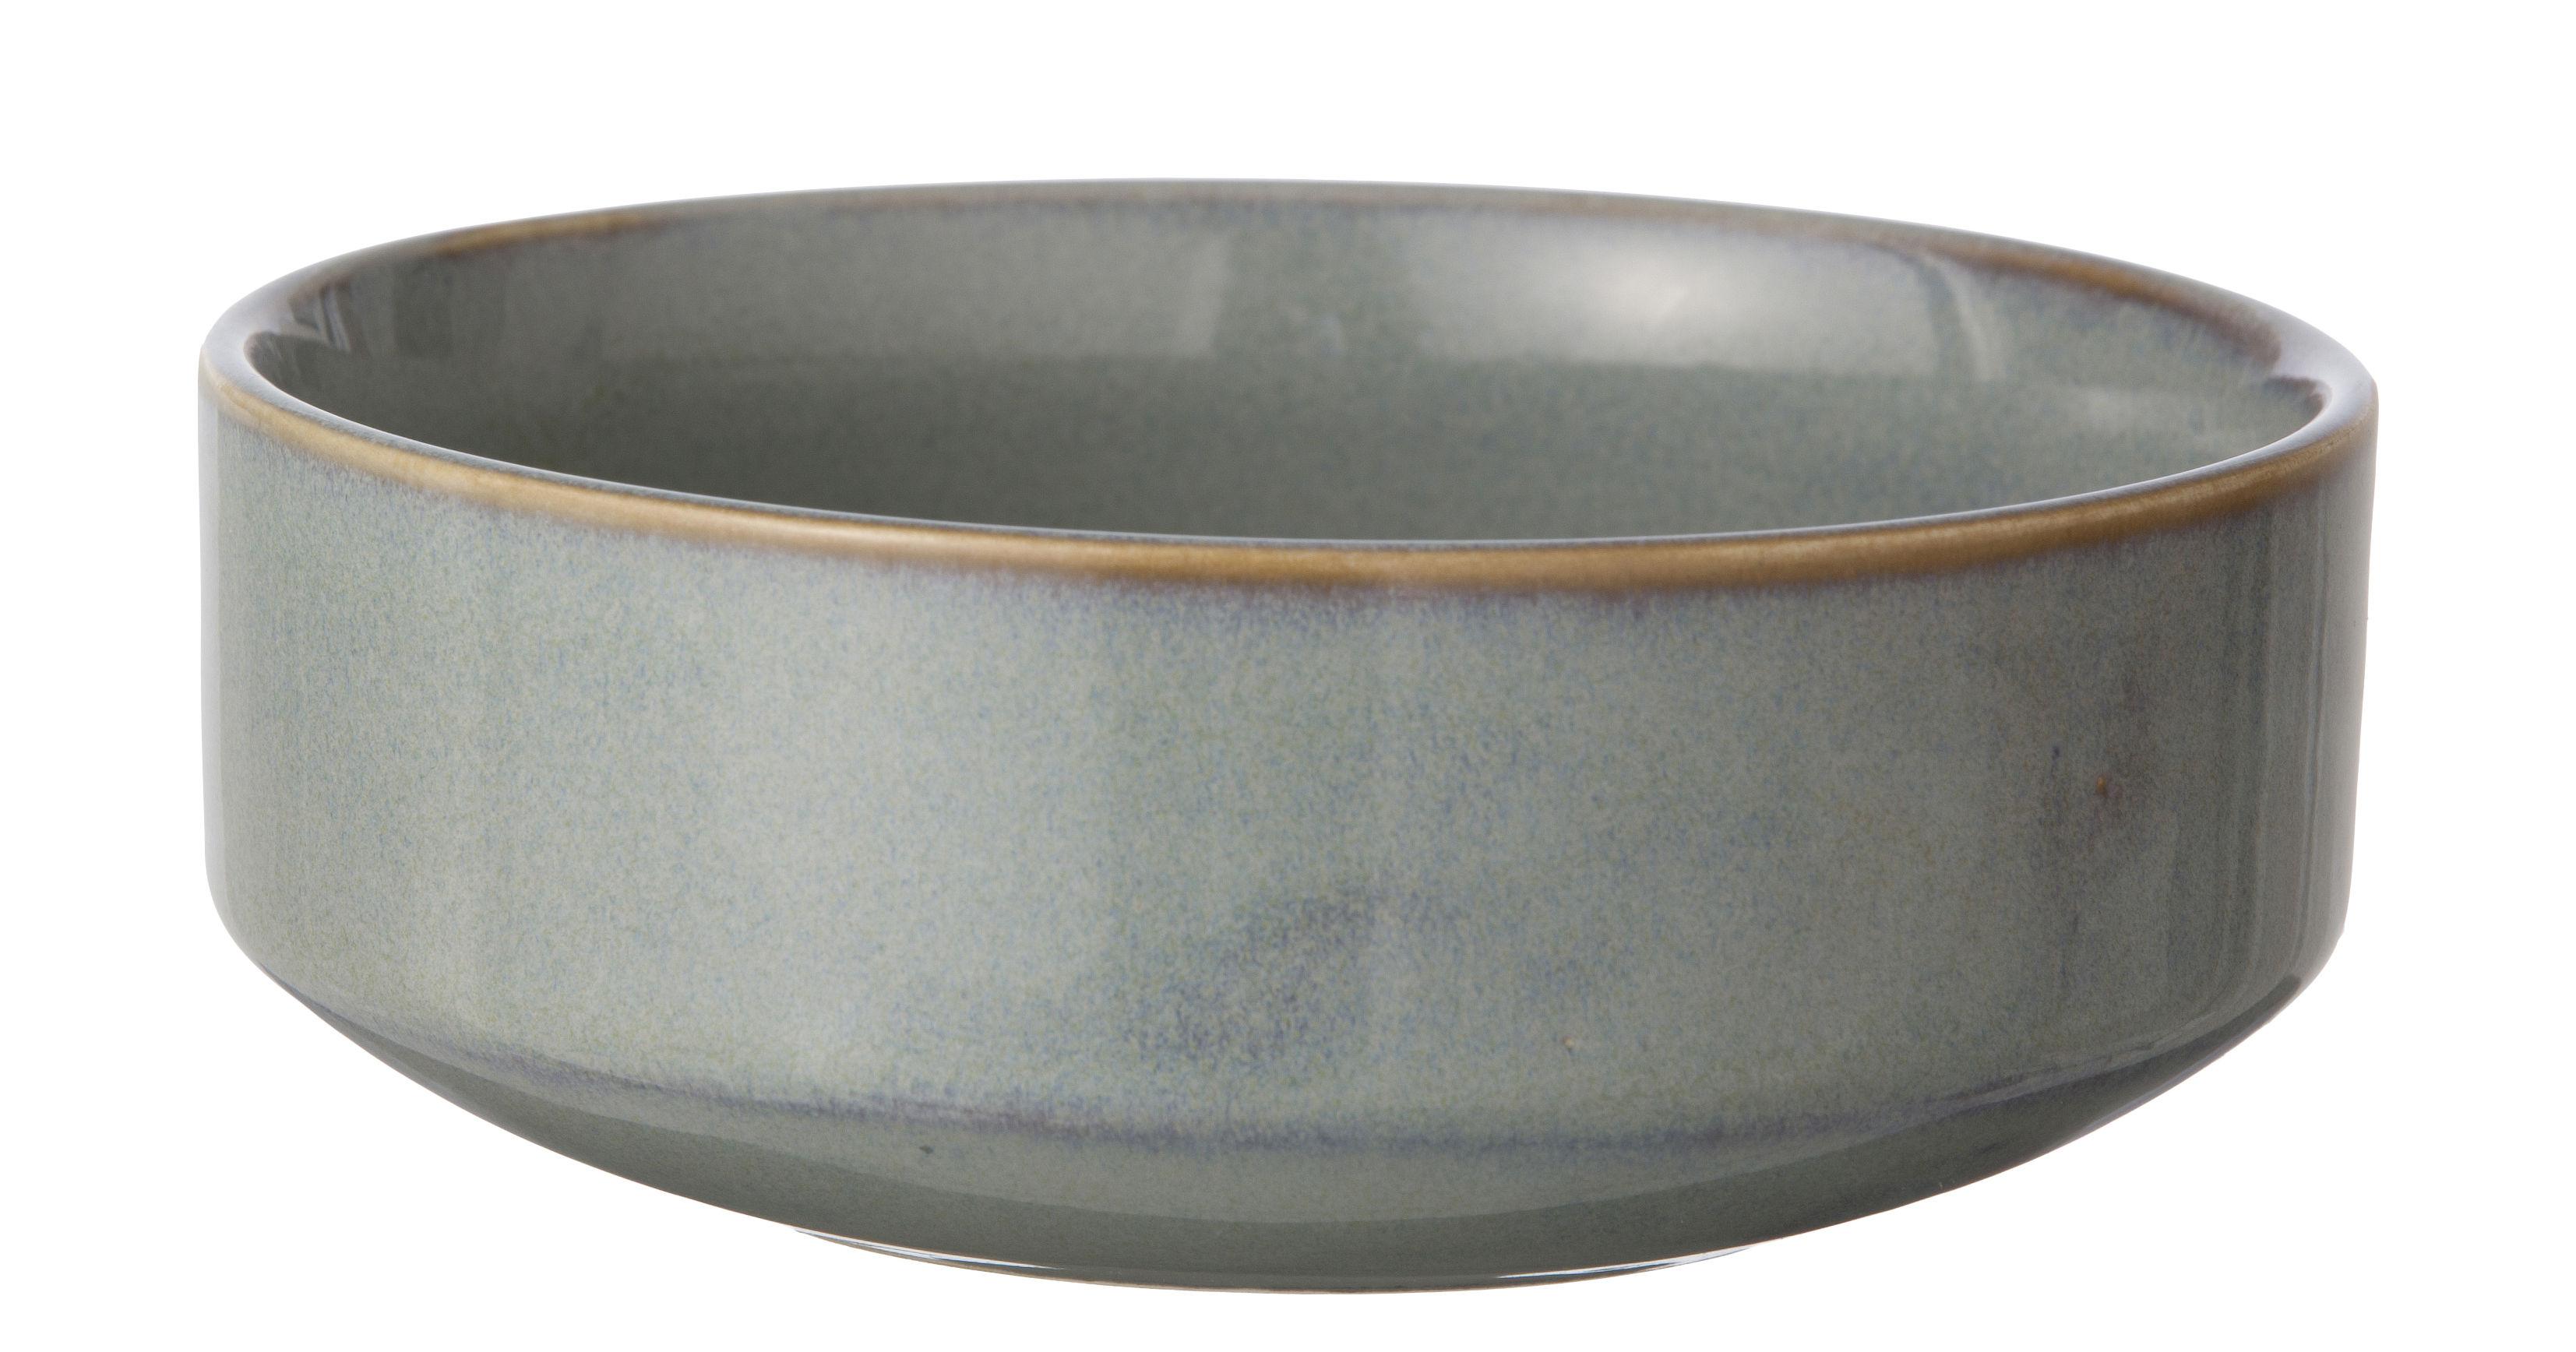 Tableware - Bowls - Neu Bowl by Ferm Living - Grey - Glazed ceramic